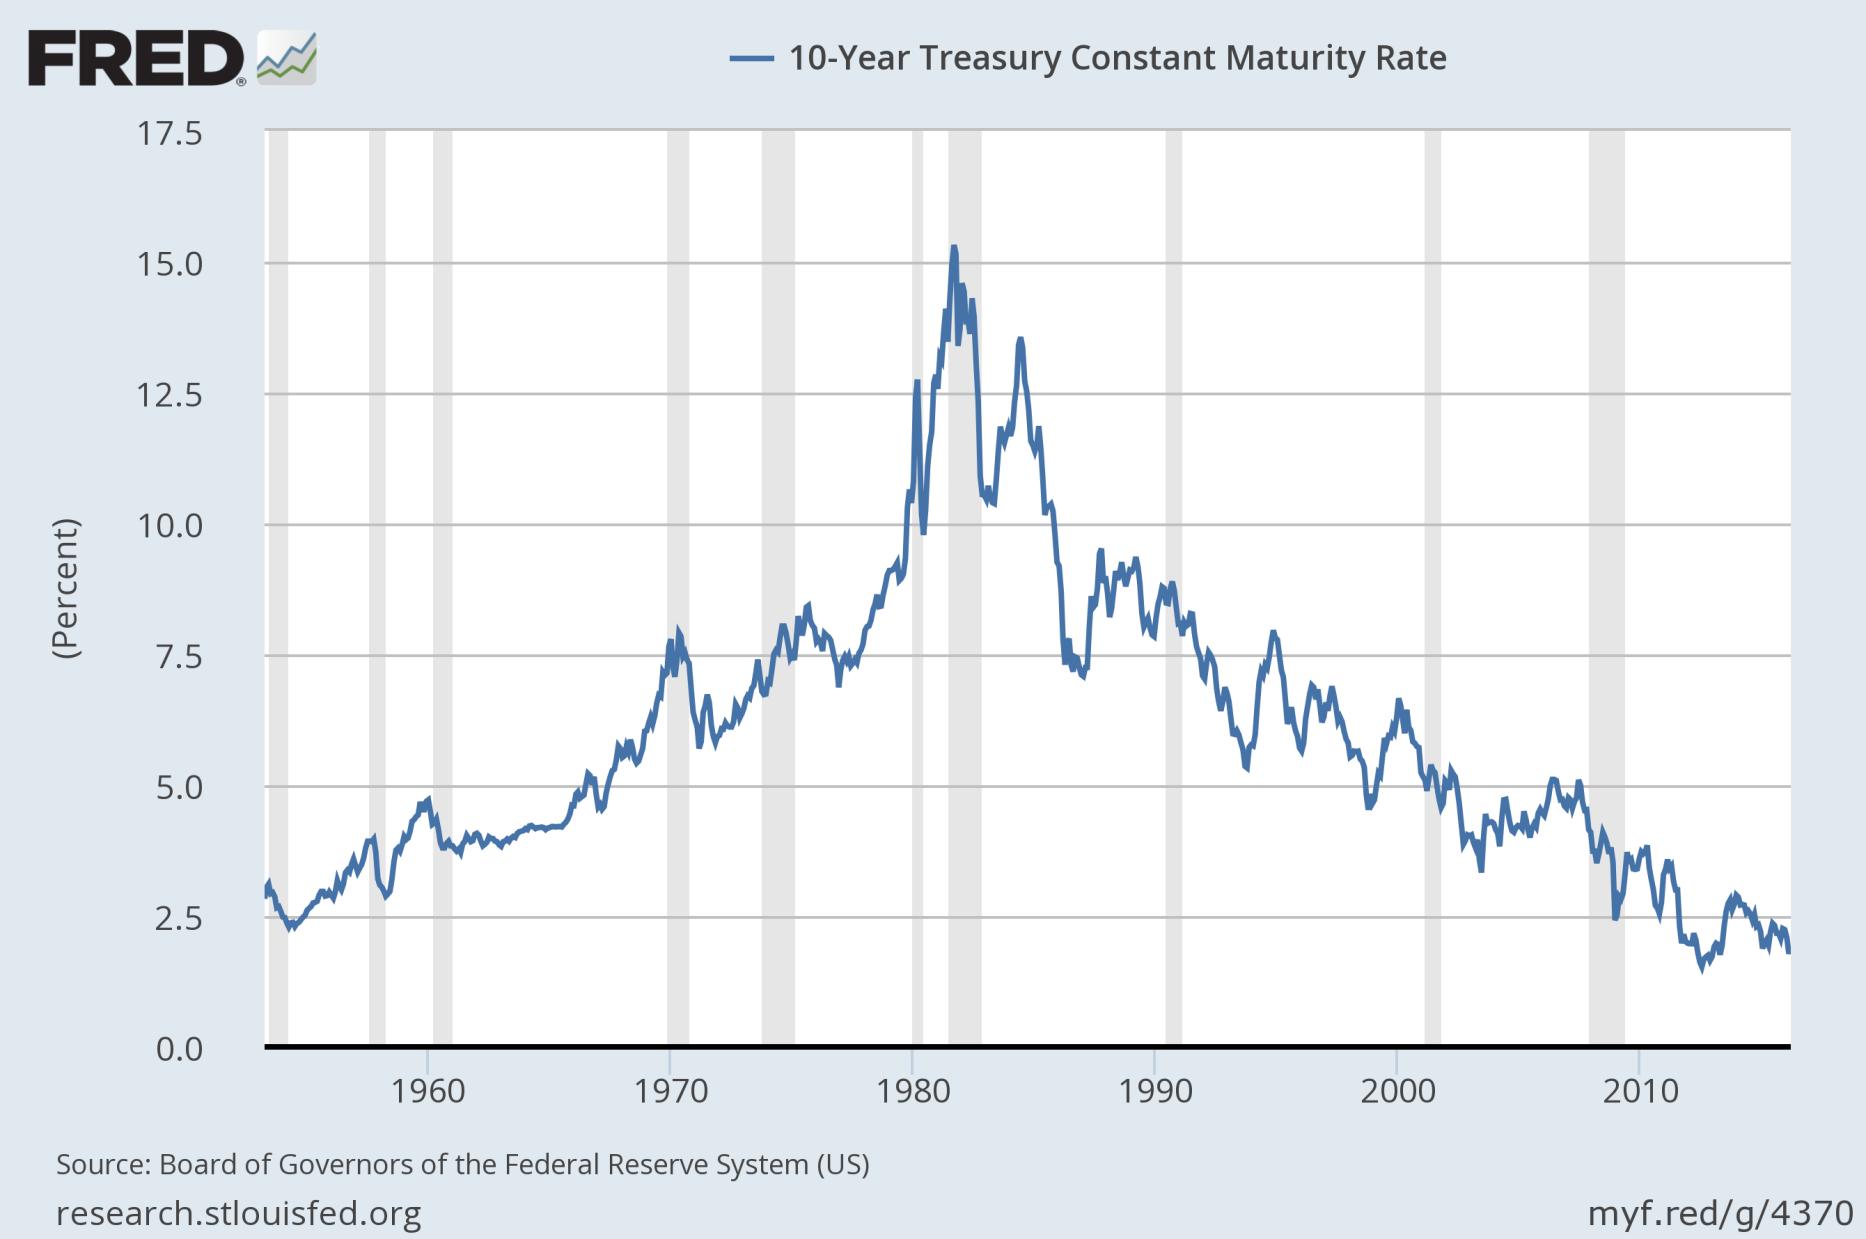 Figure 4. Ten year treasury interest rates, based on St. Louis Fed data.